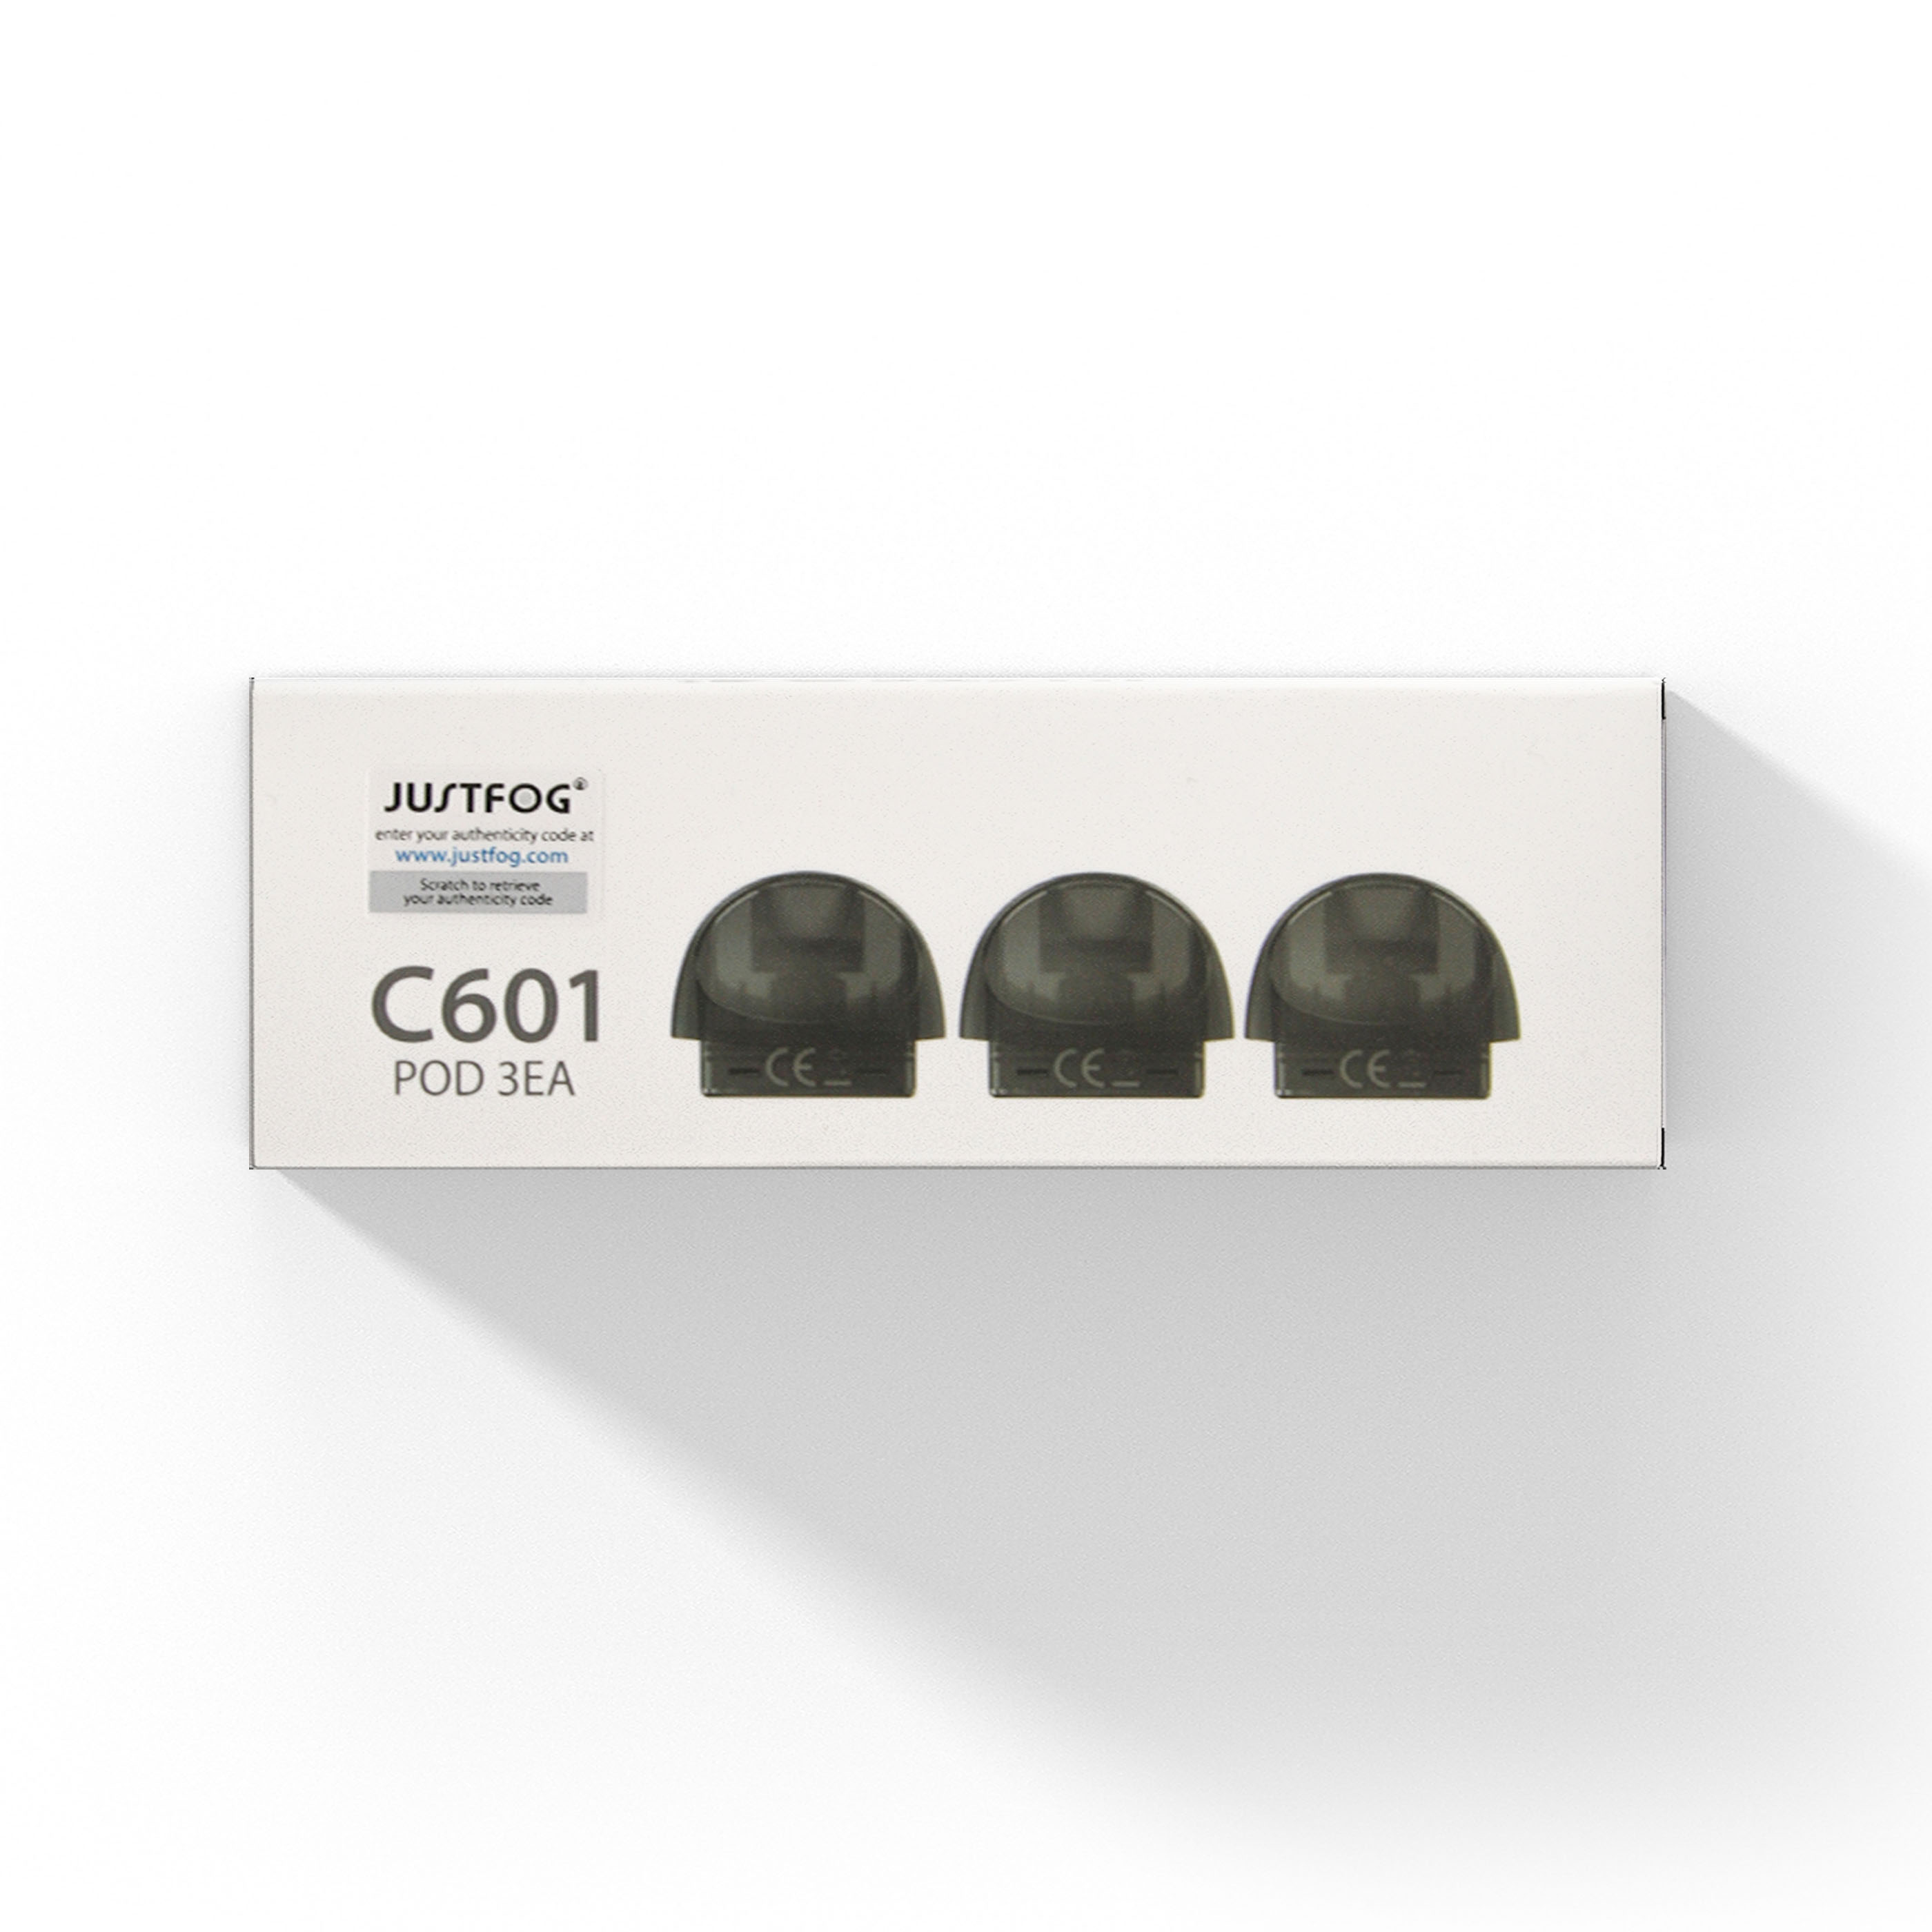 Justfog C601 Pod